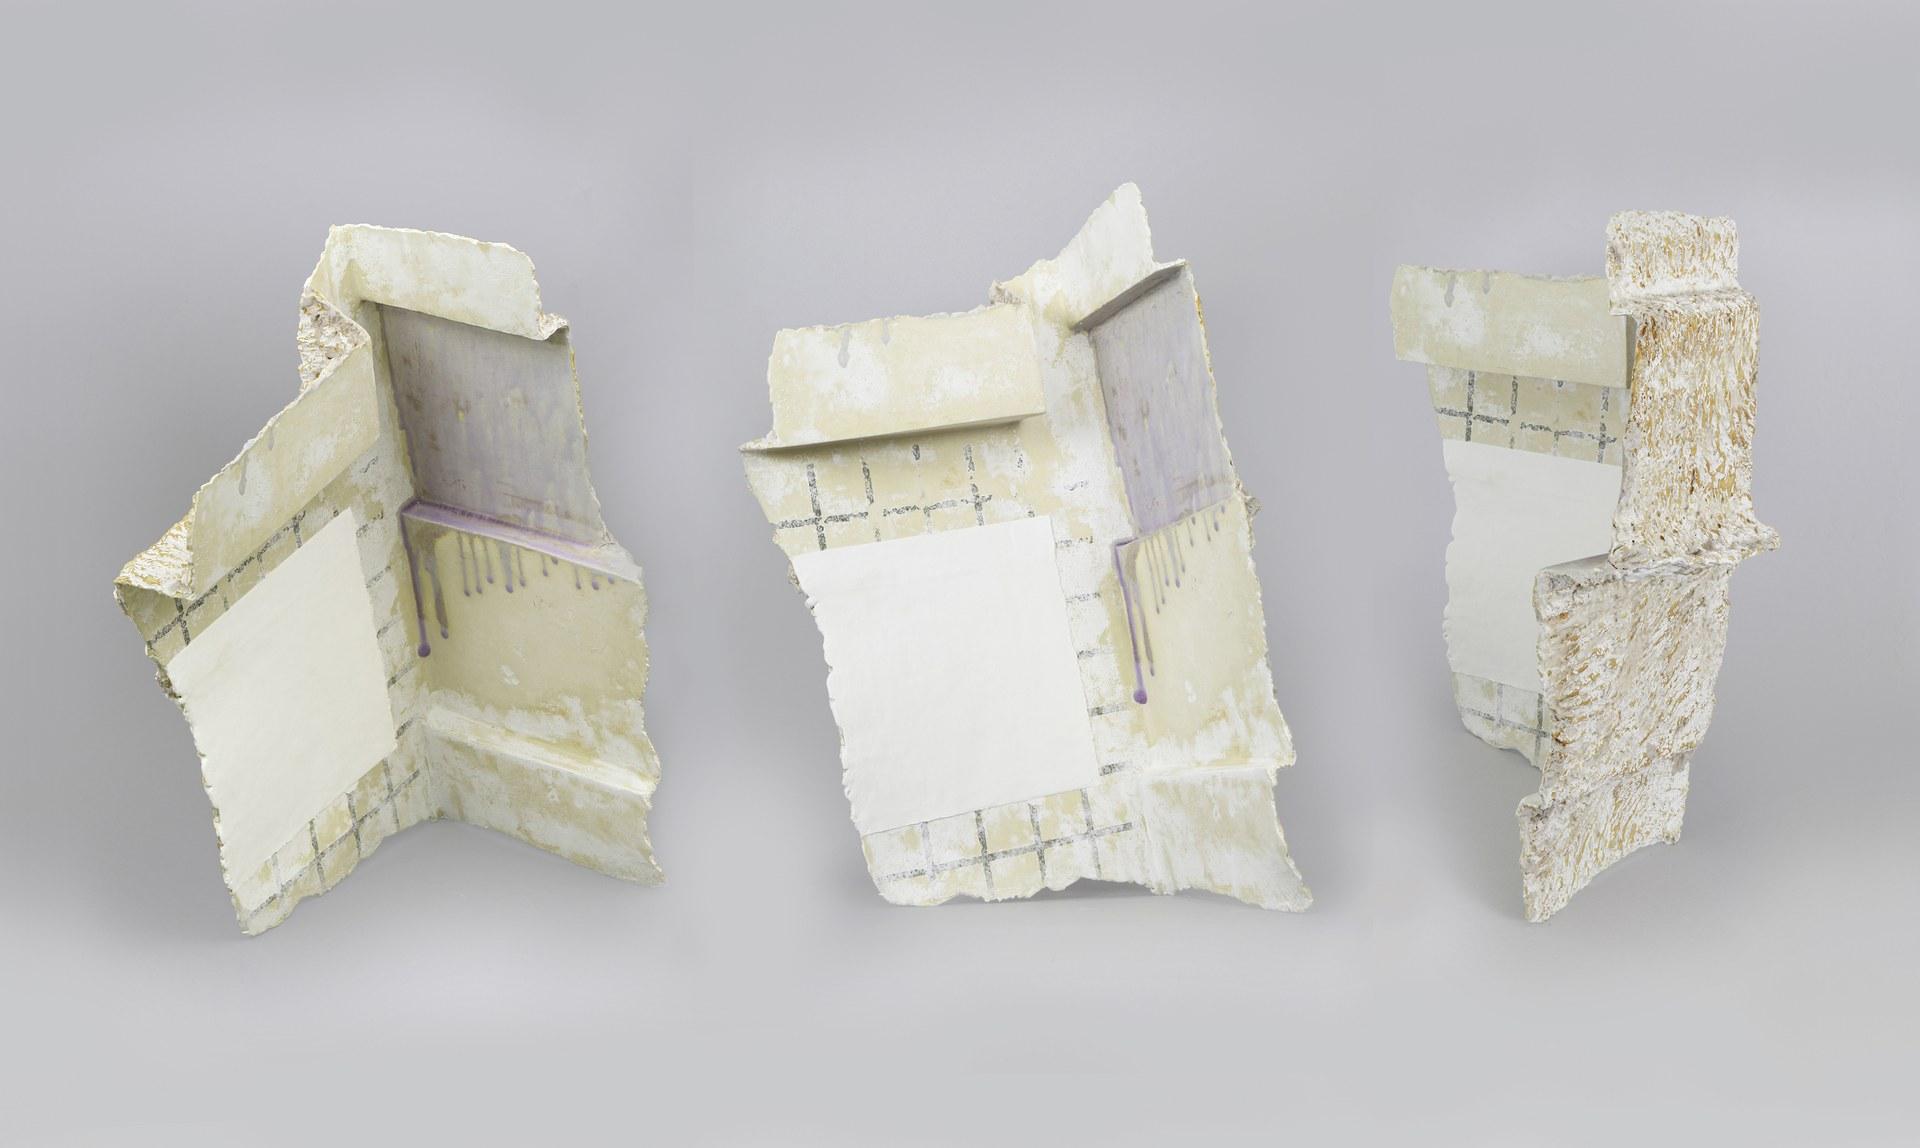 Corner Tribulations (three views), 2021, 50cm x 30cm x 28cm